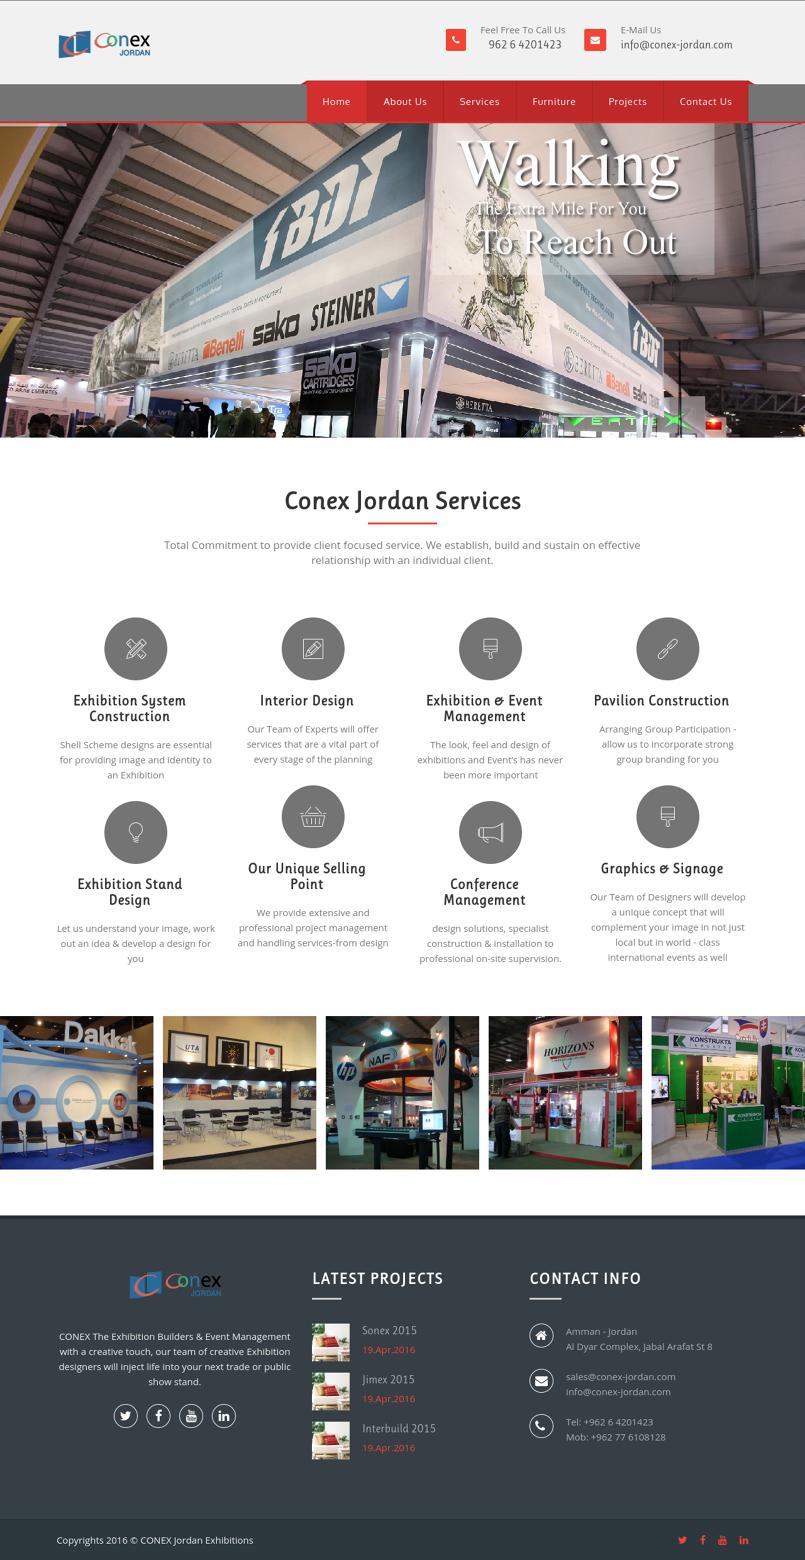 Conex Jordan 2016